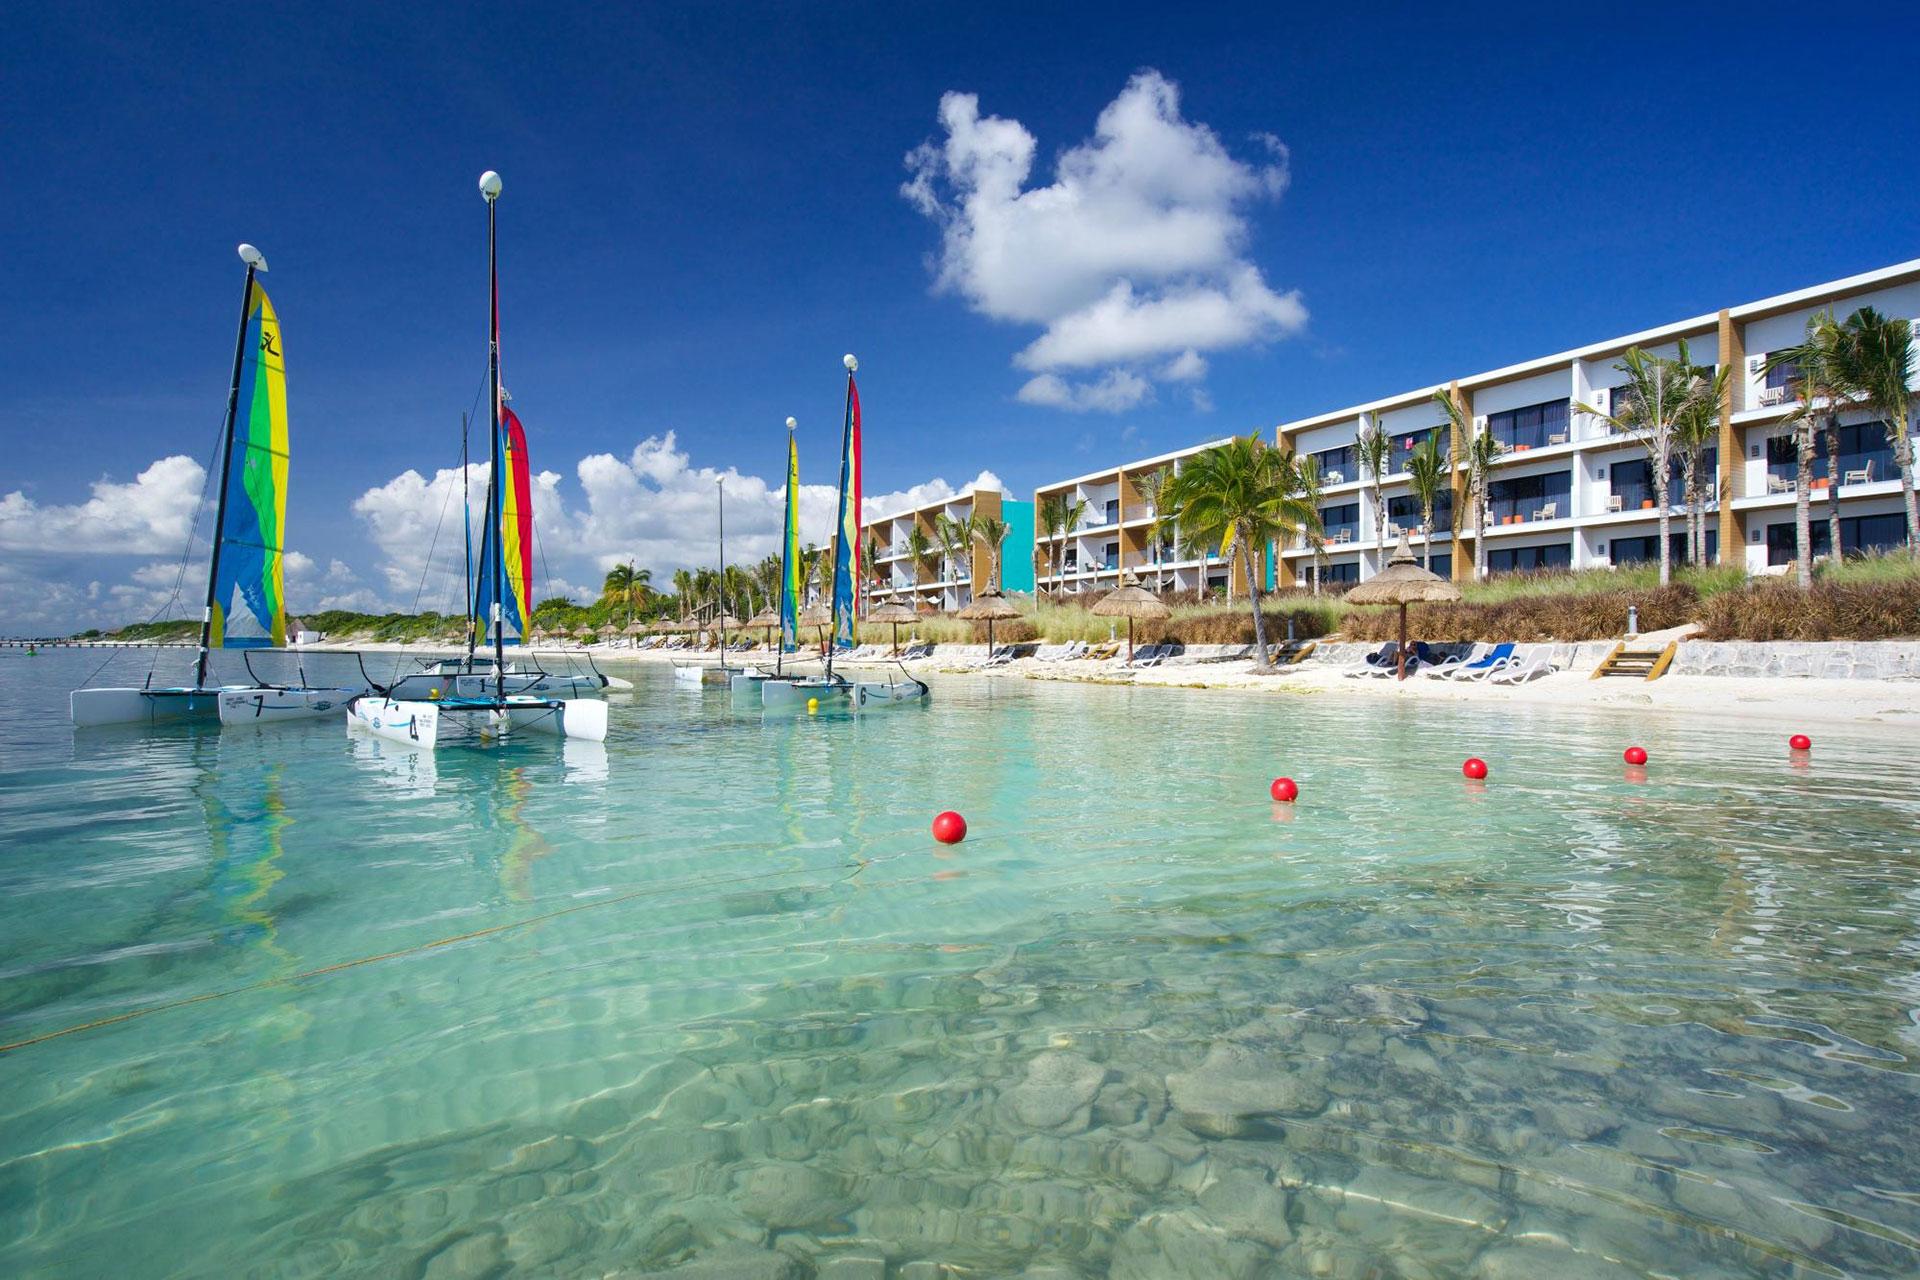 Club Med Cancun Yucatan in Cancun, Mexico